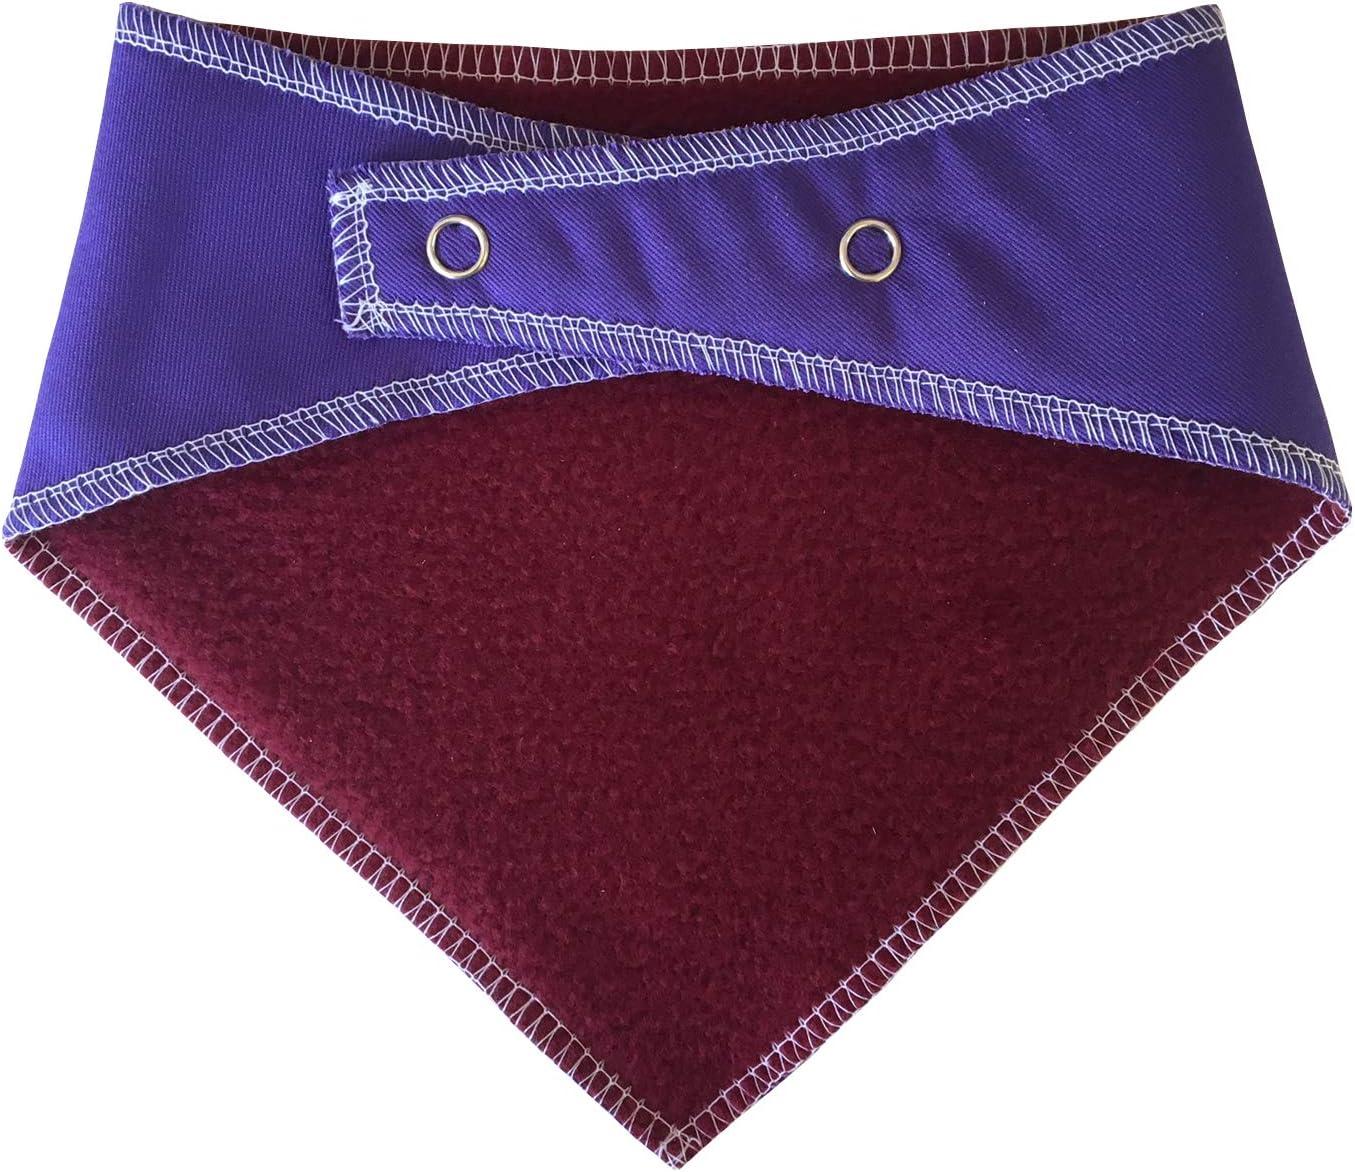 Im A Keeper Purple Dog Bandana Dog Fancy Dress Harry Potter Stick /& Ball Quidditch Fans S2 Small Dogs Shih-tzu Terriers /& Cockerpoo